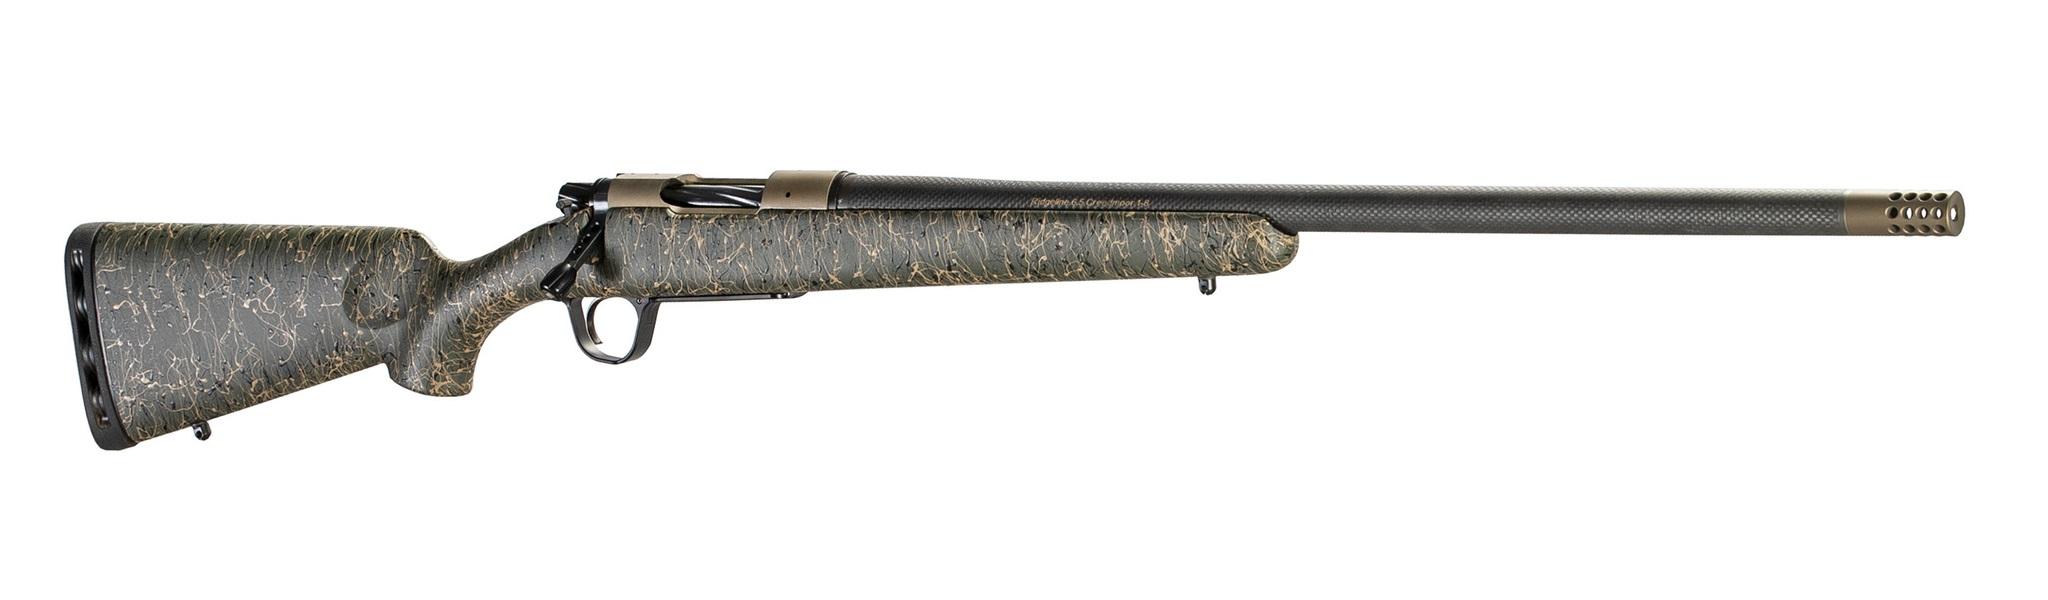 Christensen Arms Ridgeline 26 Nosler